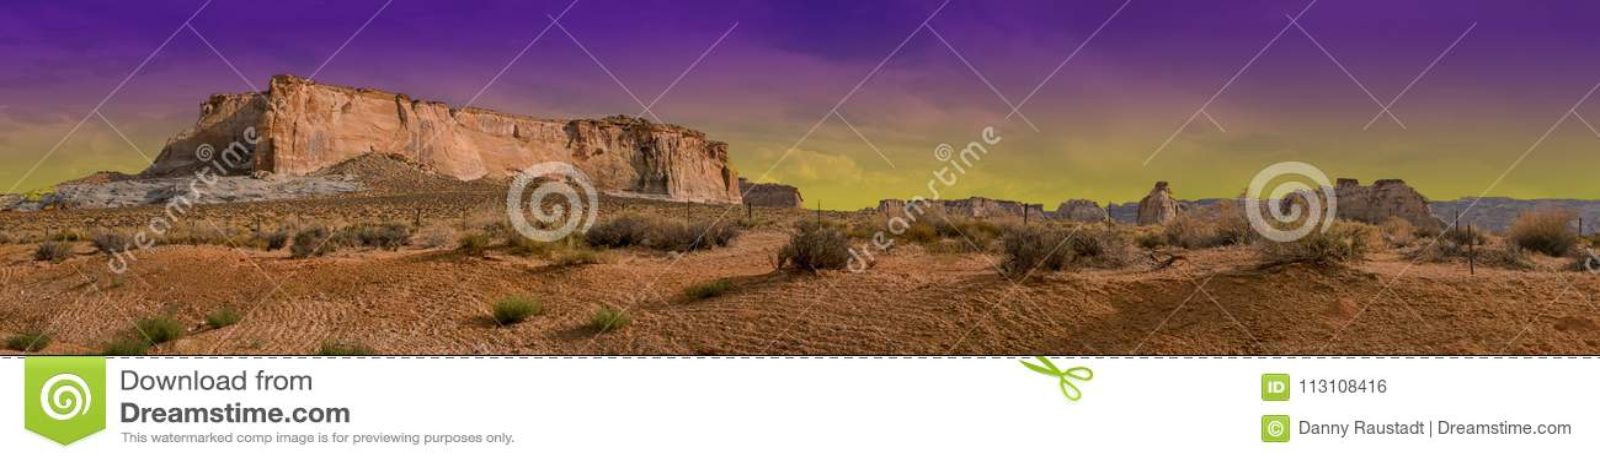 Glen Canyon Arizona Desert Purple Haze Sky